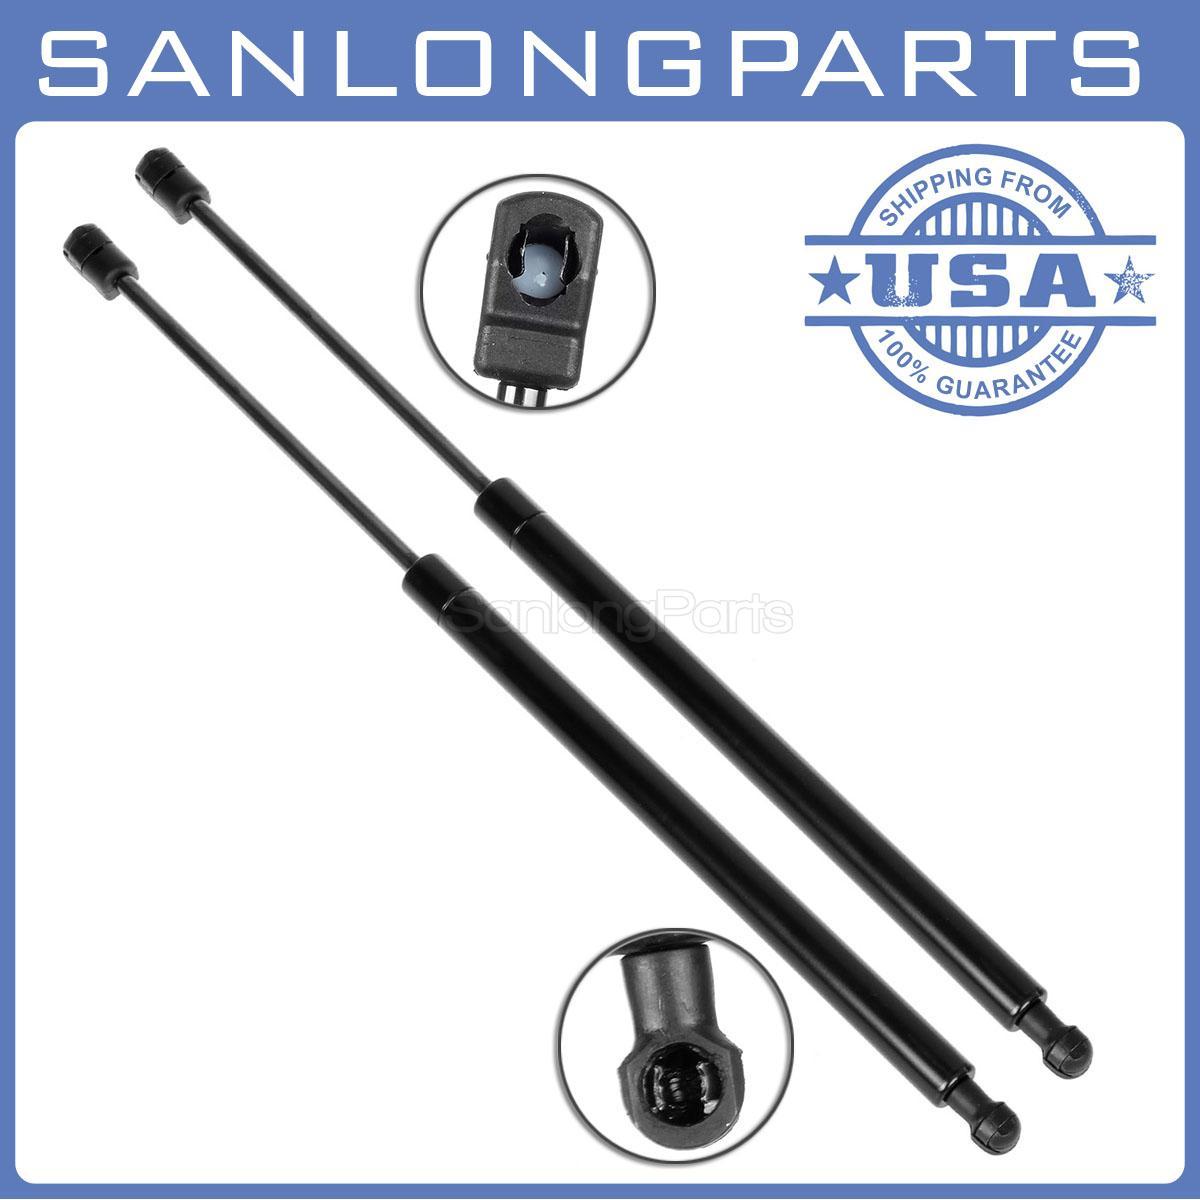 2Pcs Liftgate Lift Support Strut Shock Gas Spring Rod For Pontiac Vibe 2003-2008